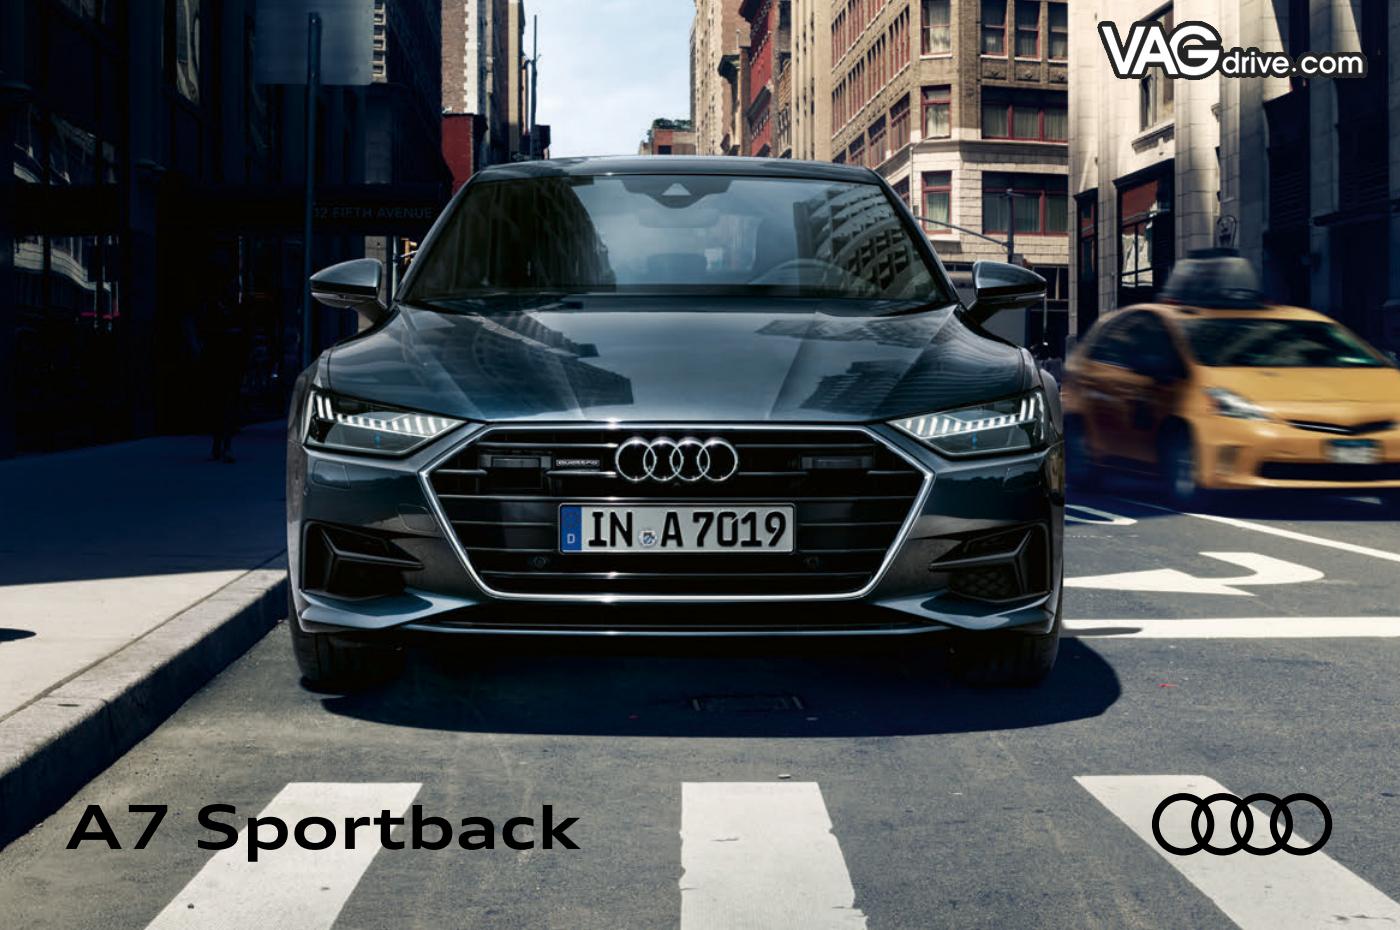 Audi_A7_C8_rus_brochure_12.2018.jpg